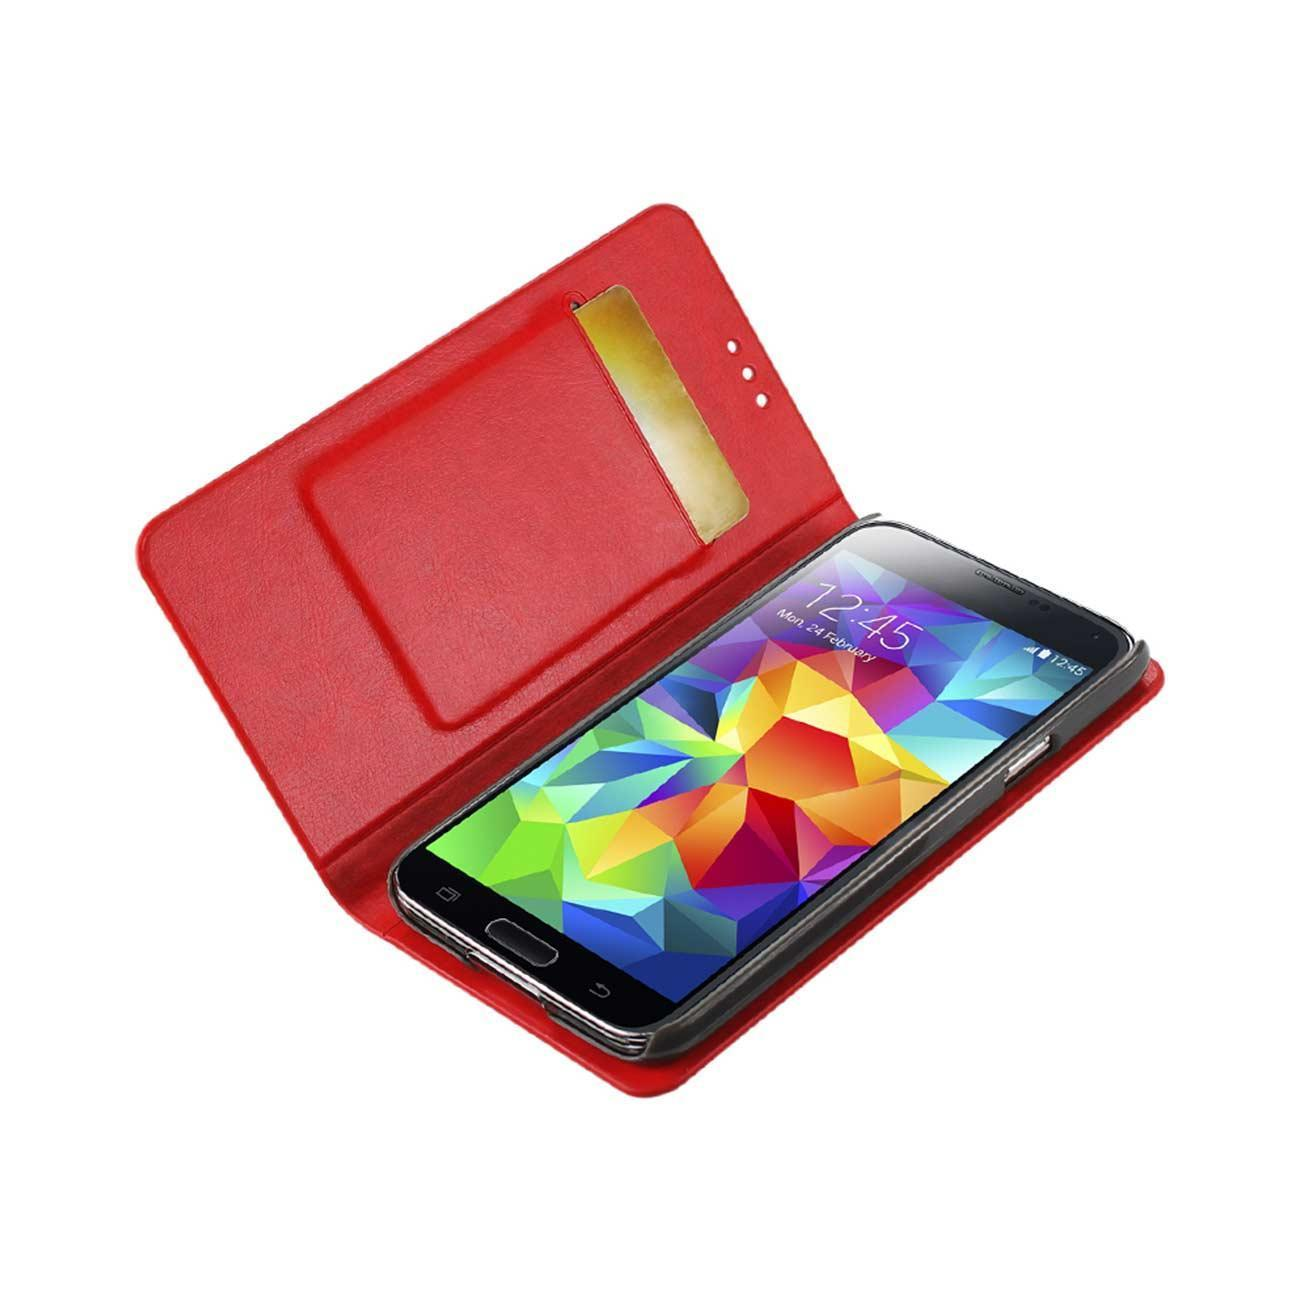 Reiko Samsung Galaxy S5 Flip Folio Case With Card Holder In Red